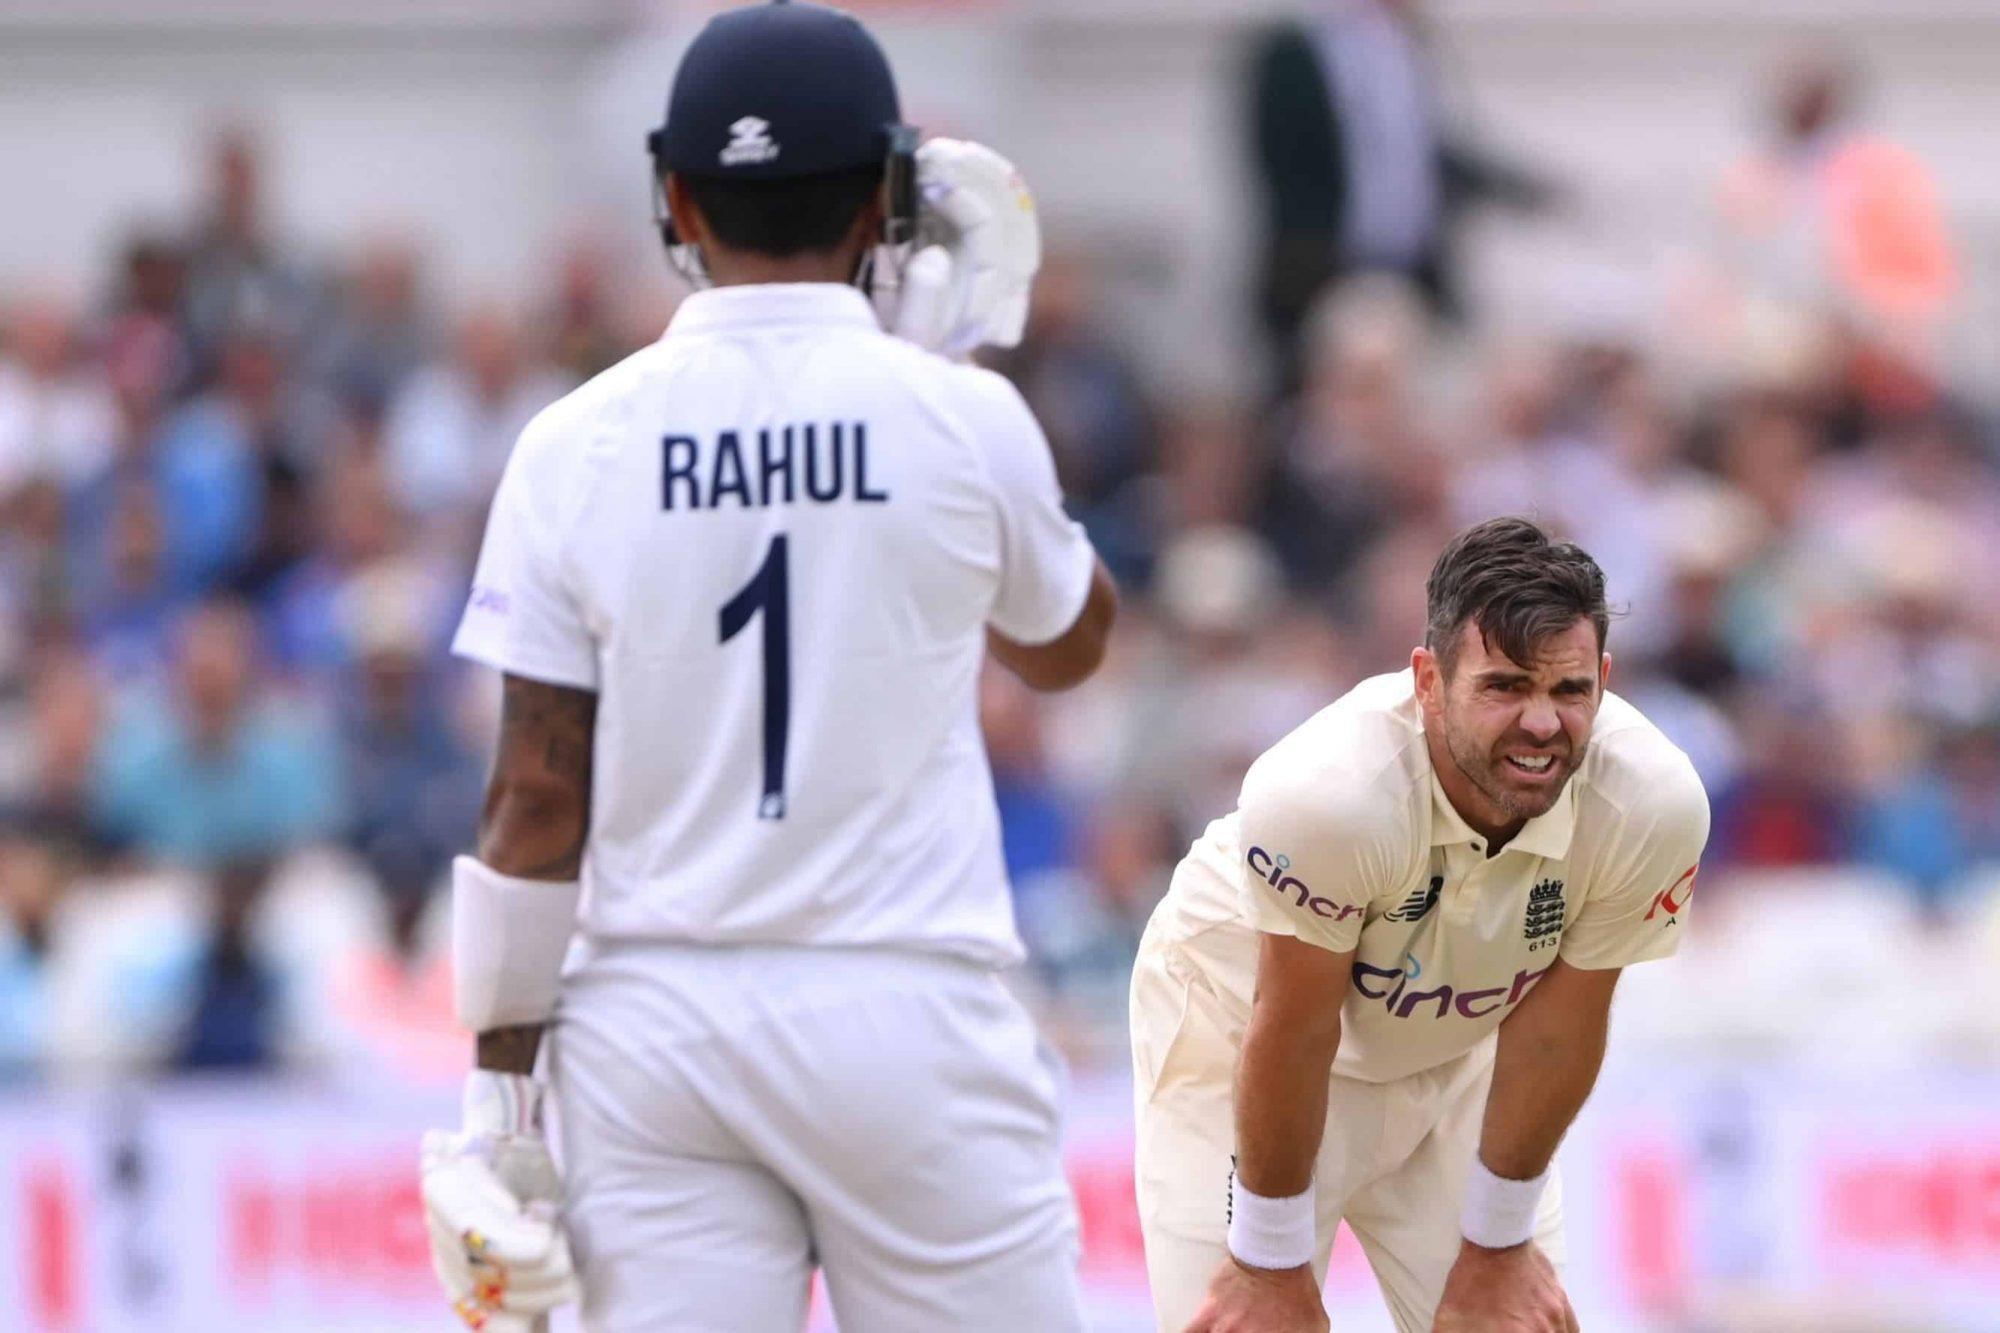 ENG vs IND Test: KL Rahul 2018 vs KL Rahul 2021 - The Changes & Improvements